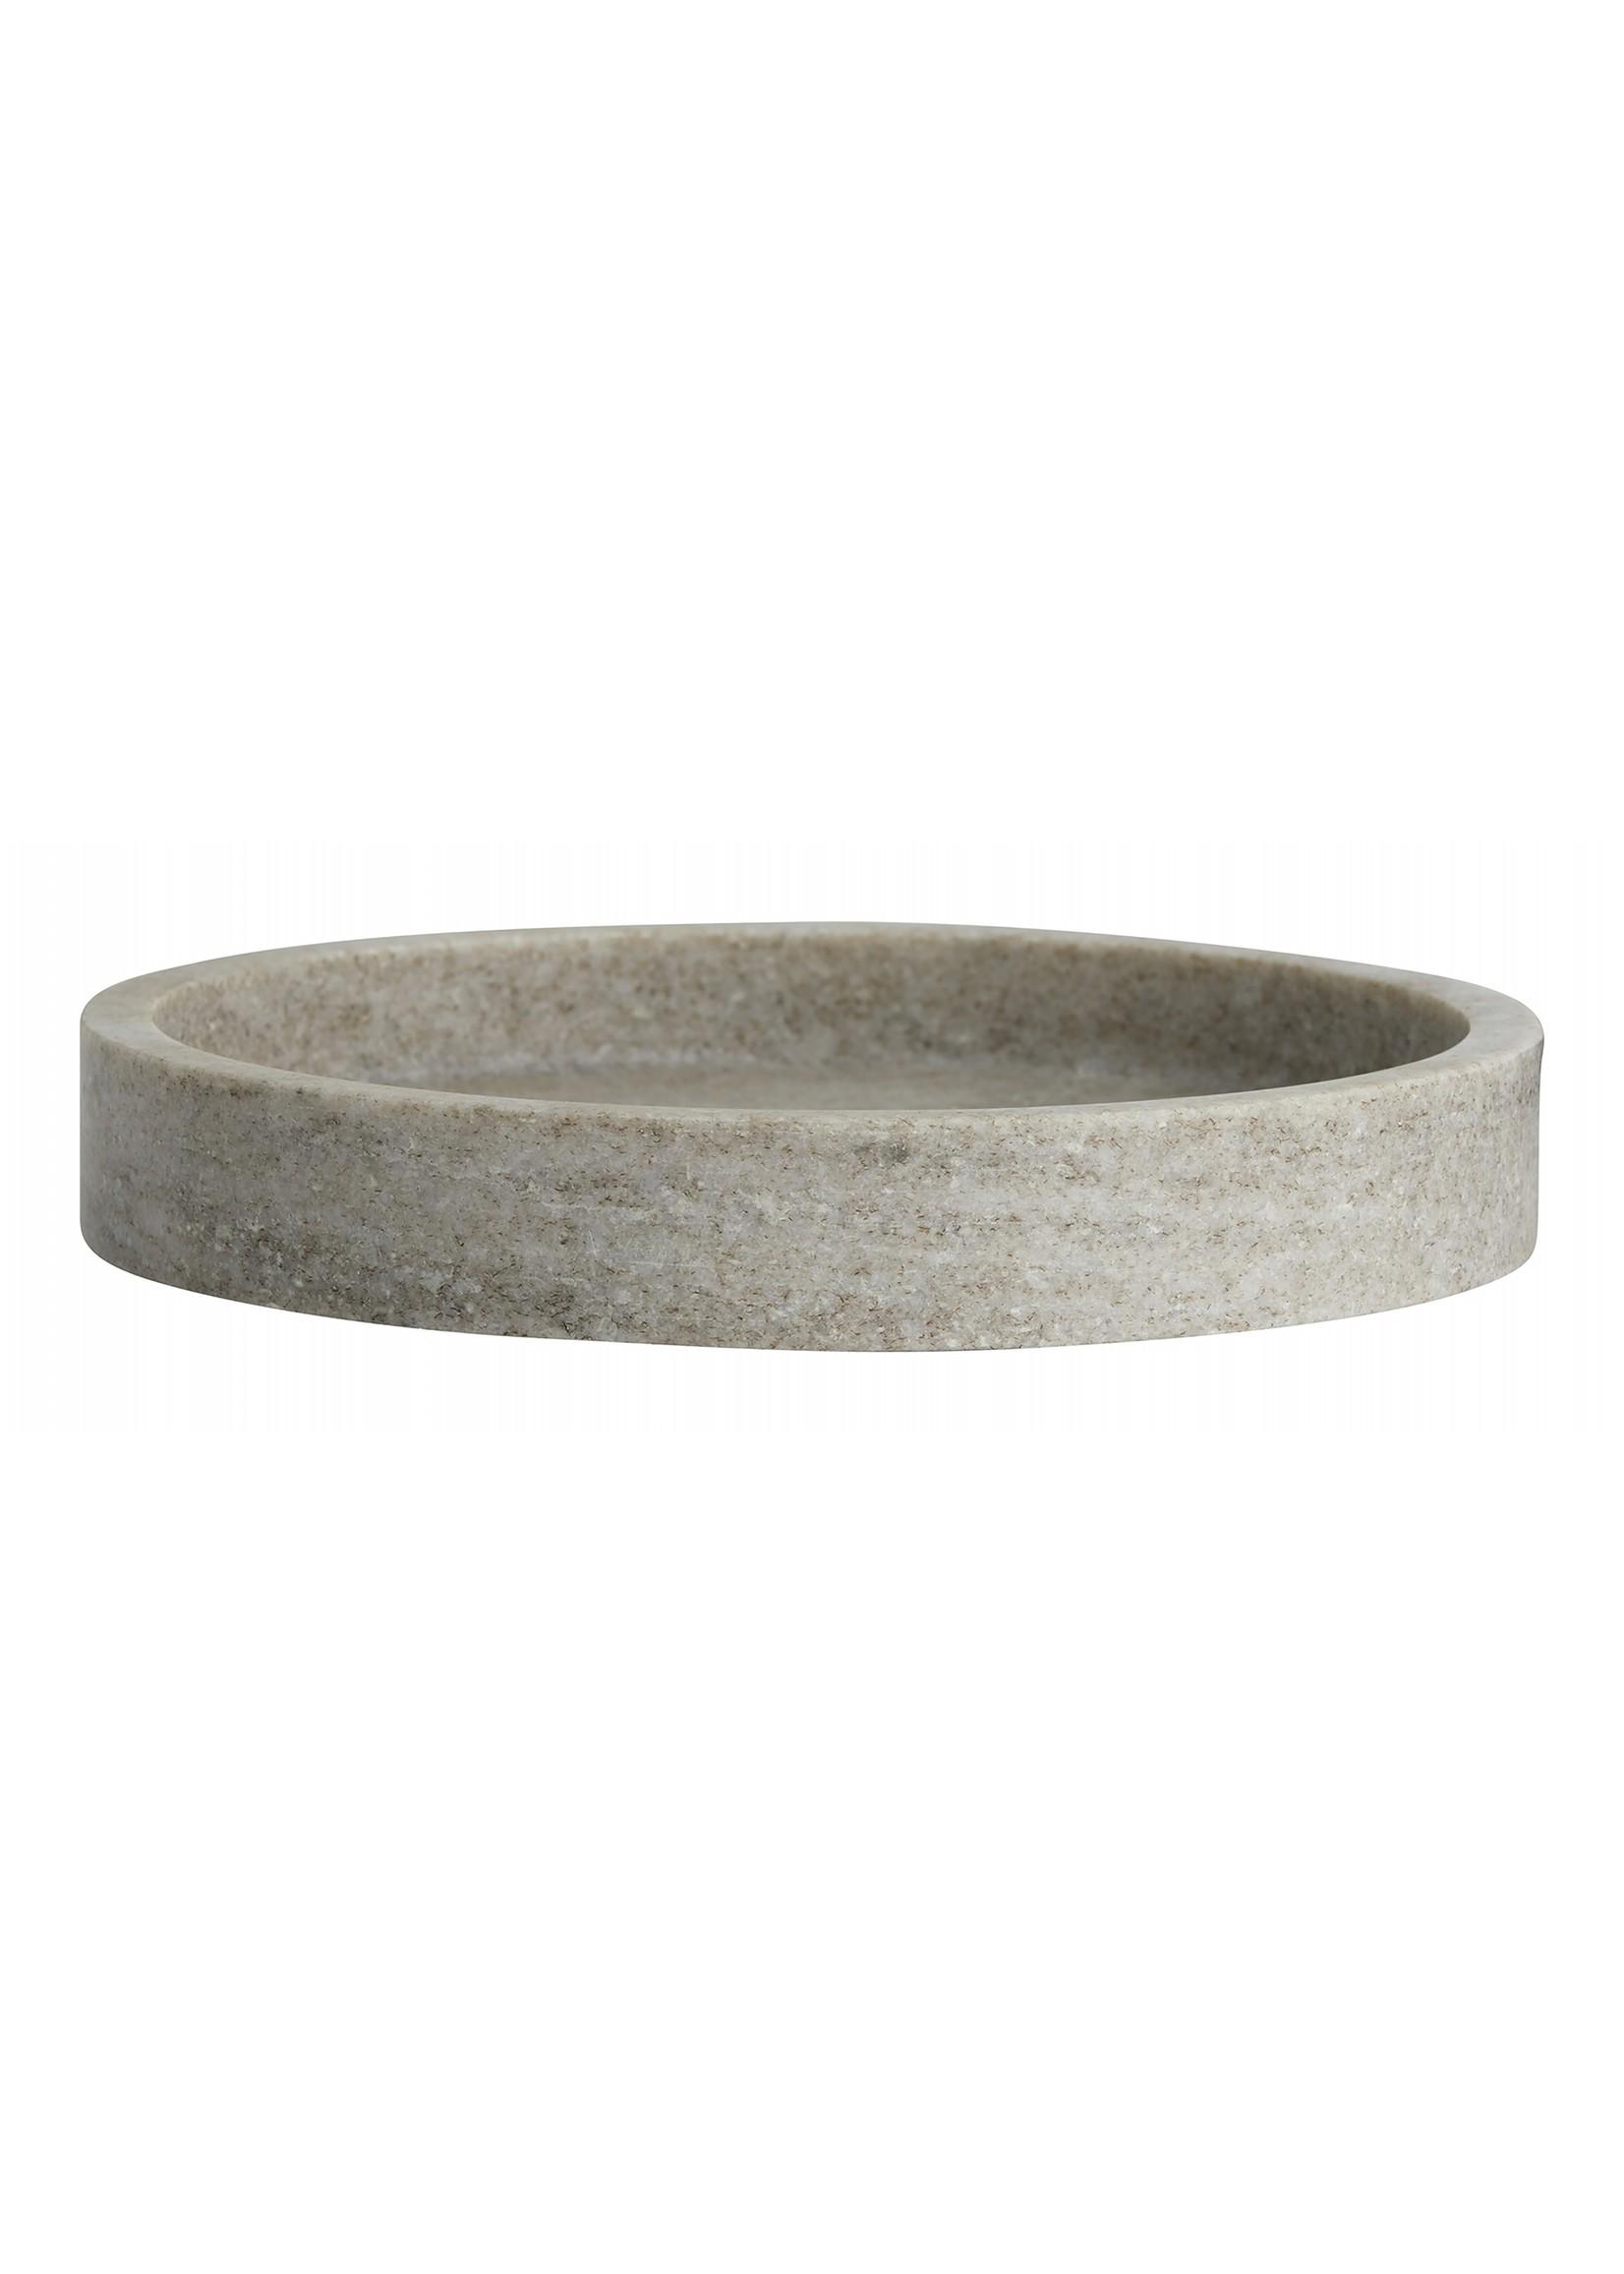 Nordal Nordal Vinga schaal bruine marmer S/2